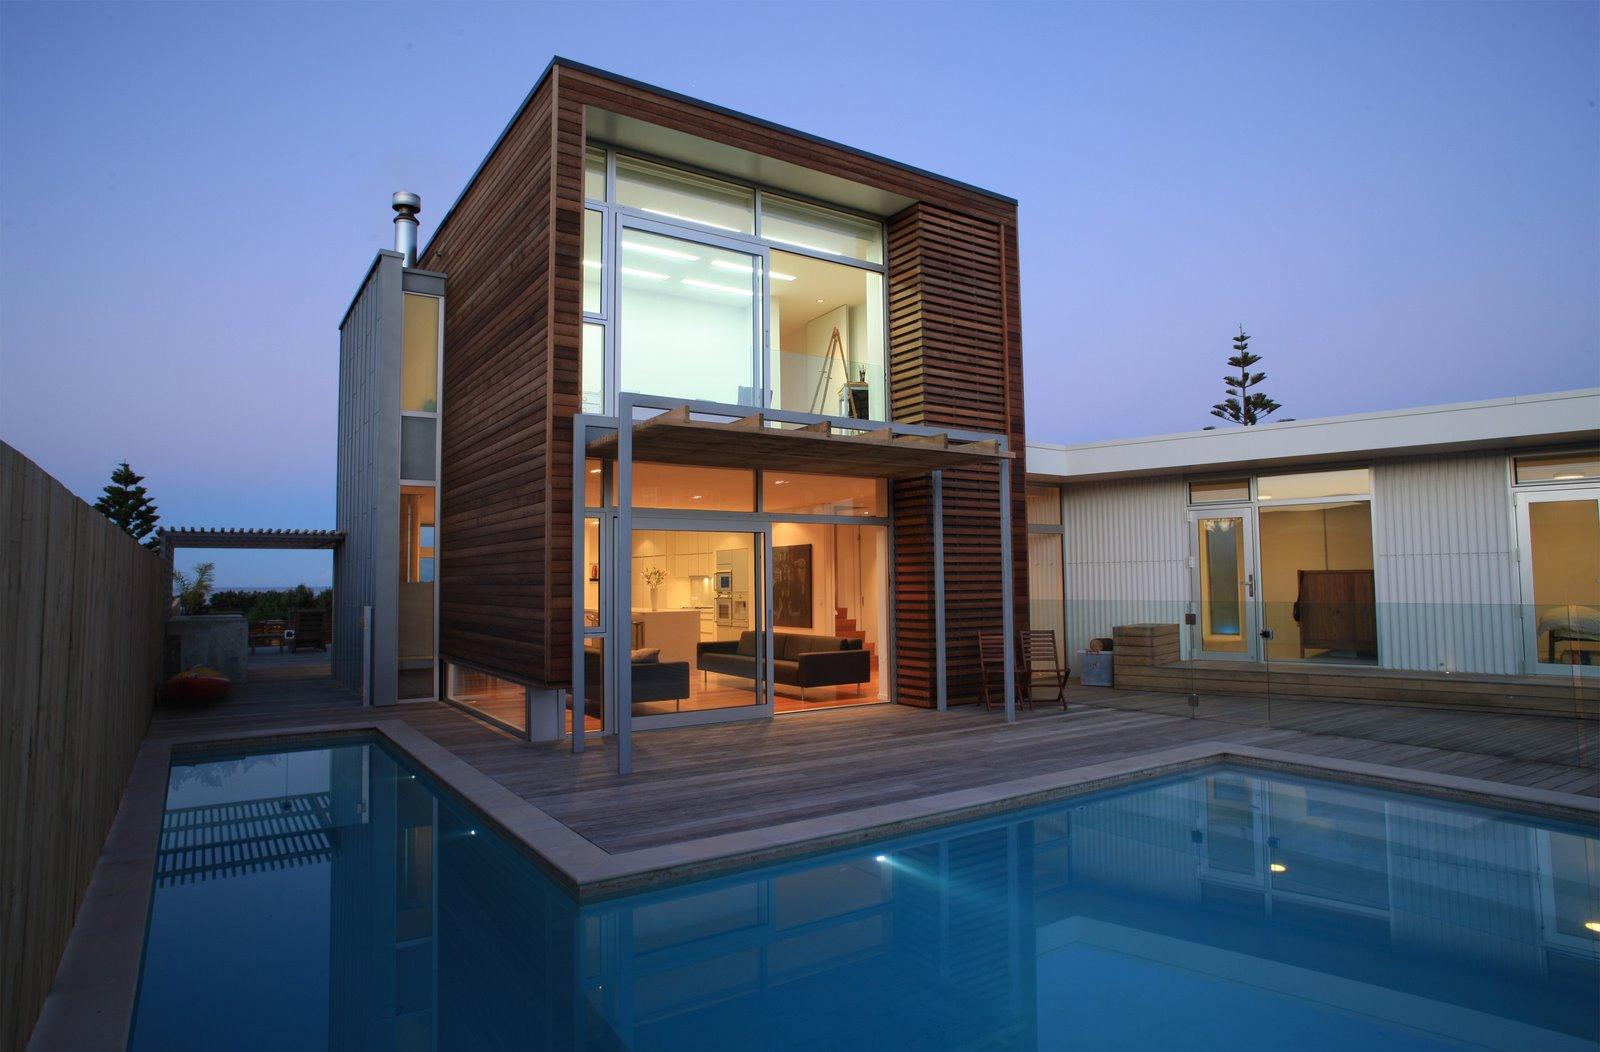 Деревянный фасад дома в стиле модерн